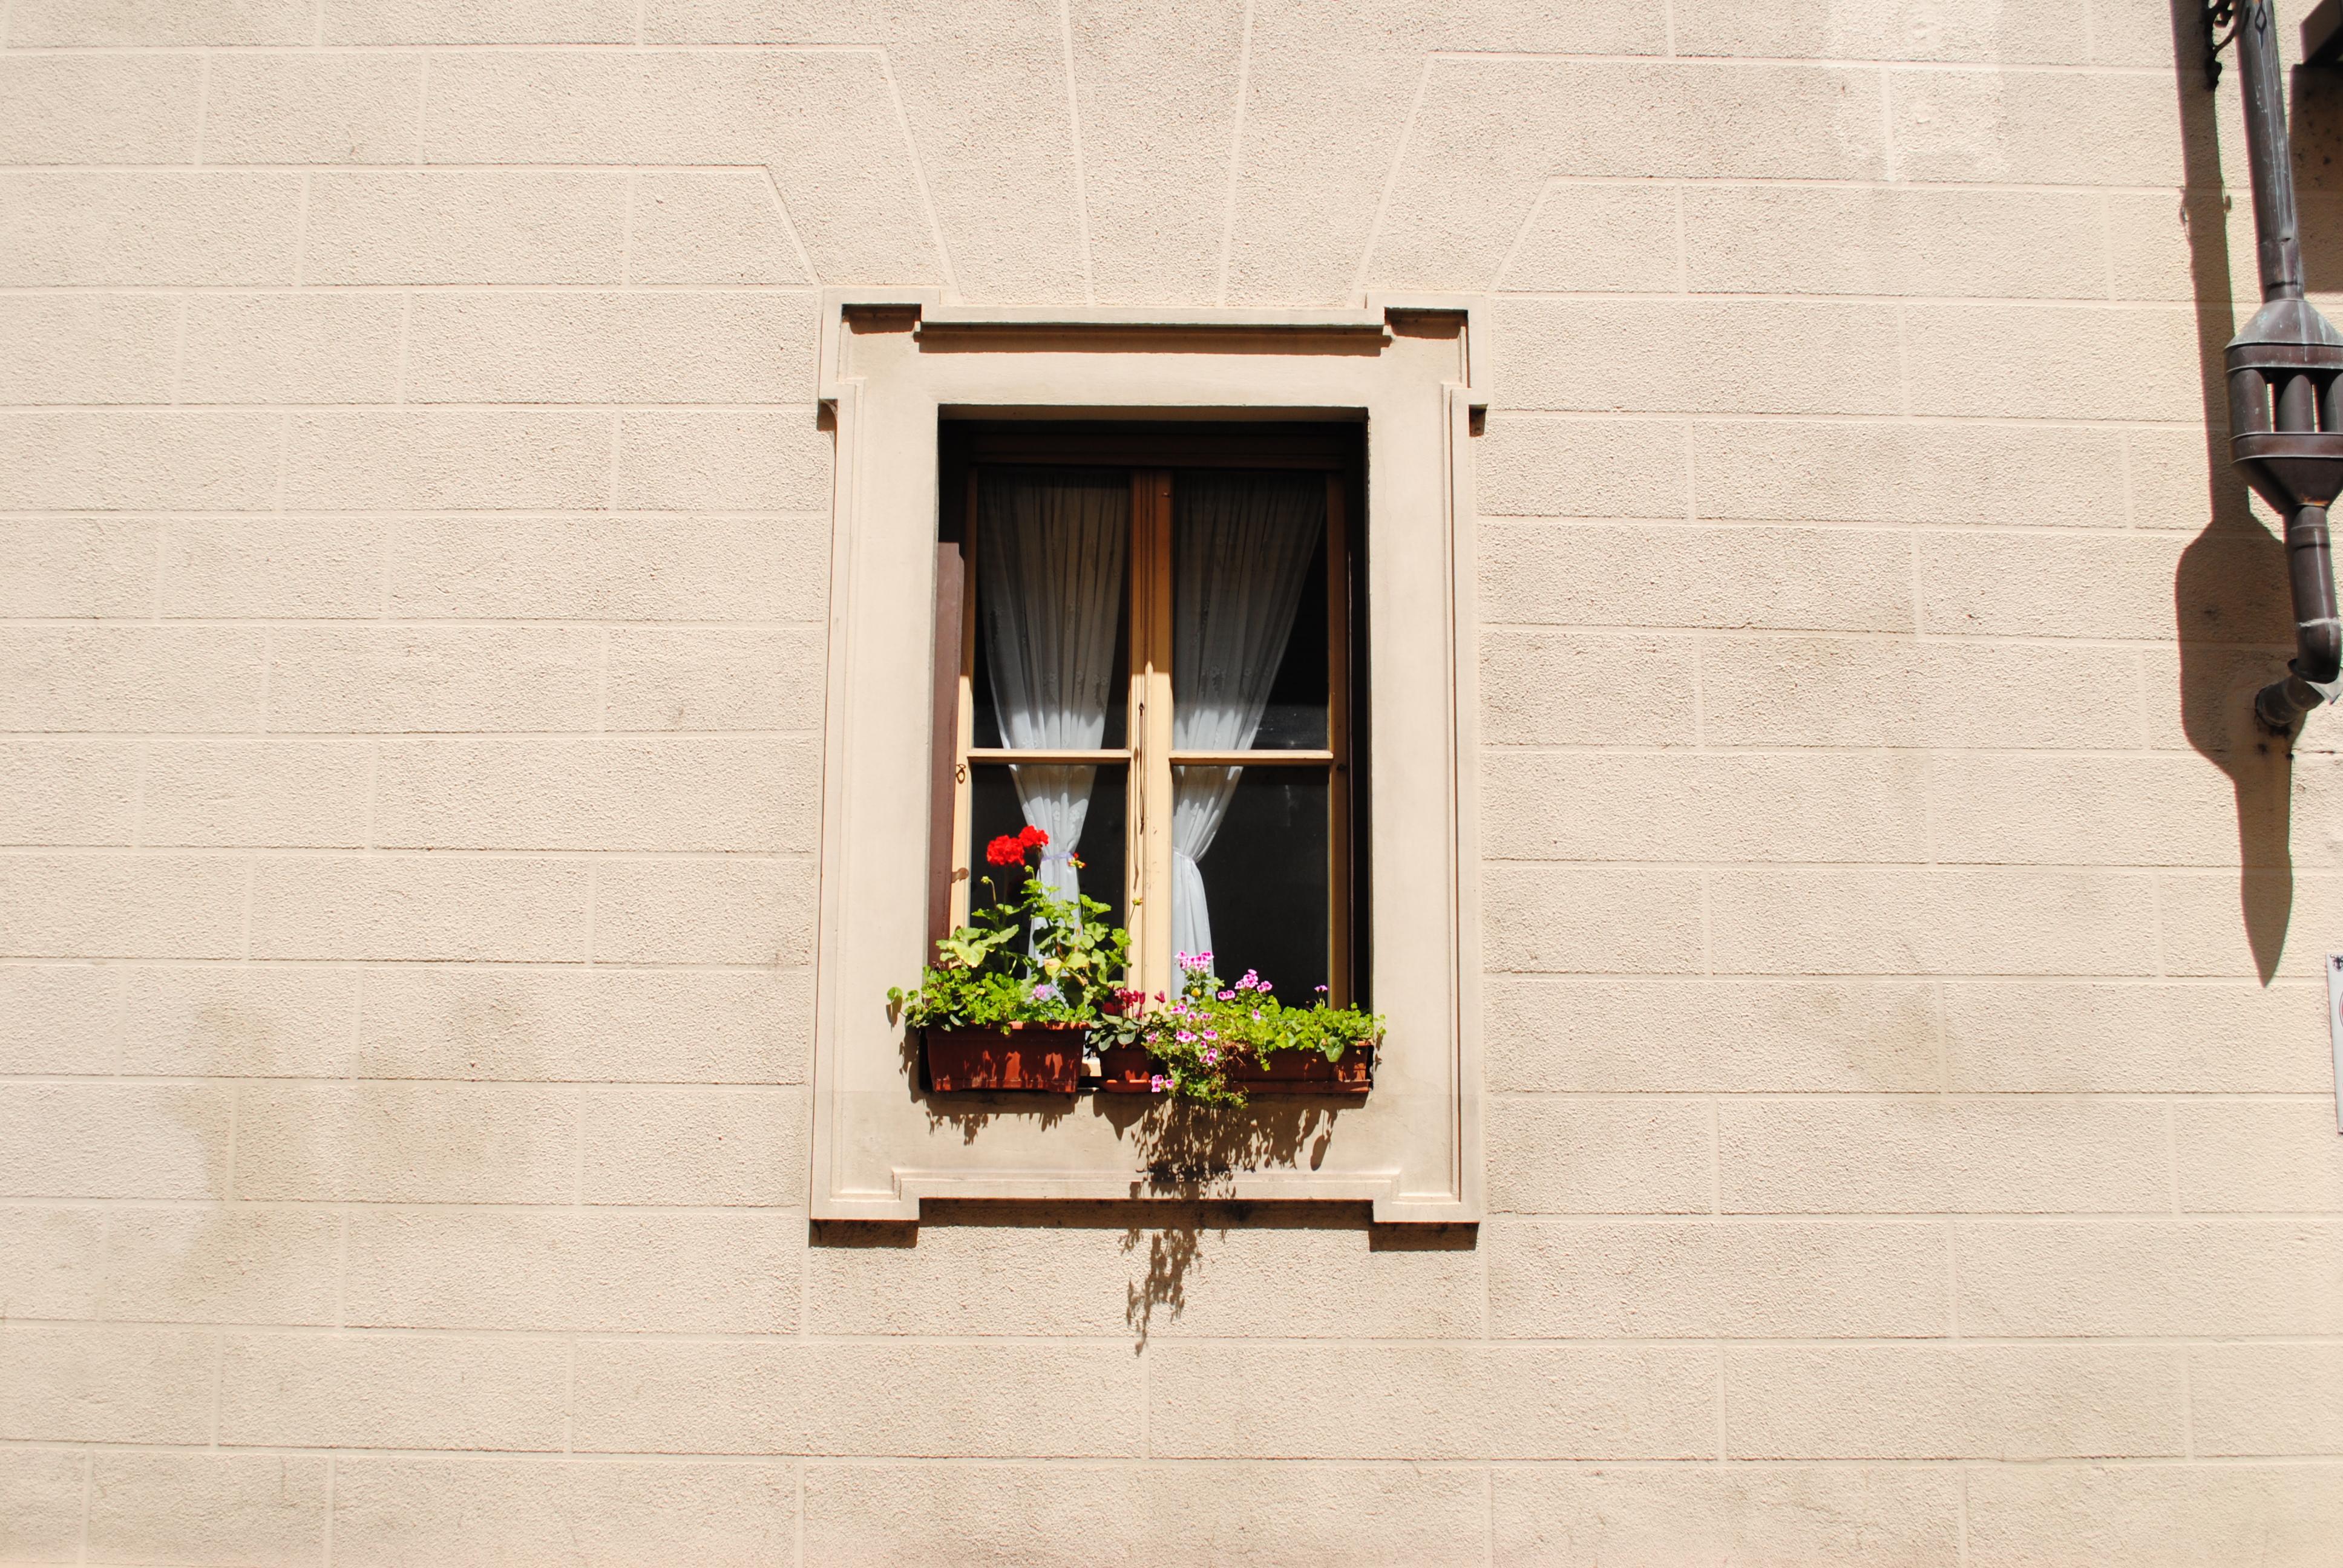 Marianna - window plants